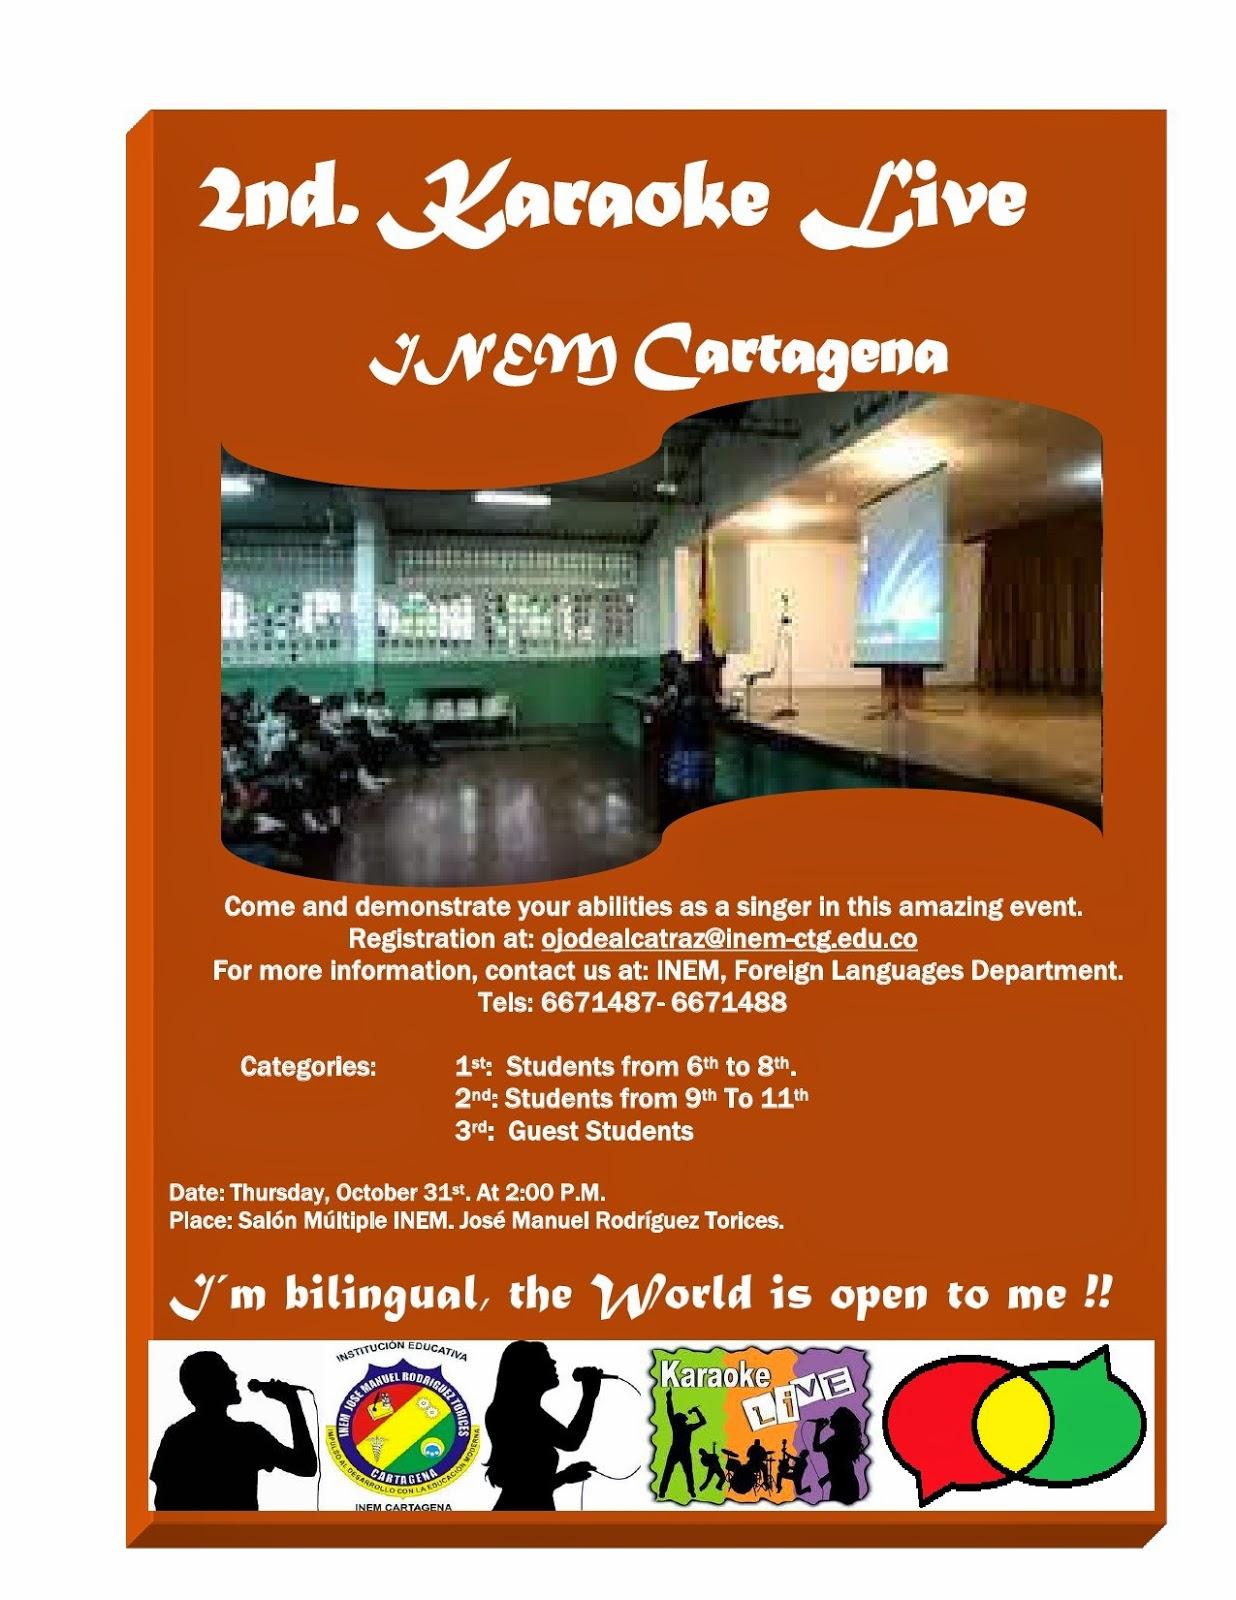 "SE ACERCA EL 2do. FESTIVAL DE KARAOKE EN INGLÉS ""2nd: KARAOKE LIVE FESTIVAL - INEM CARTAGENA"""